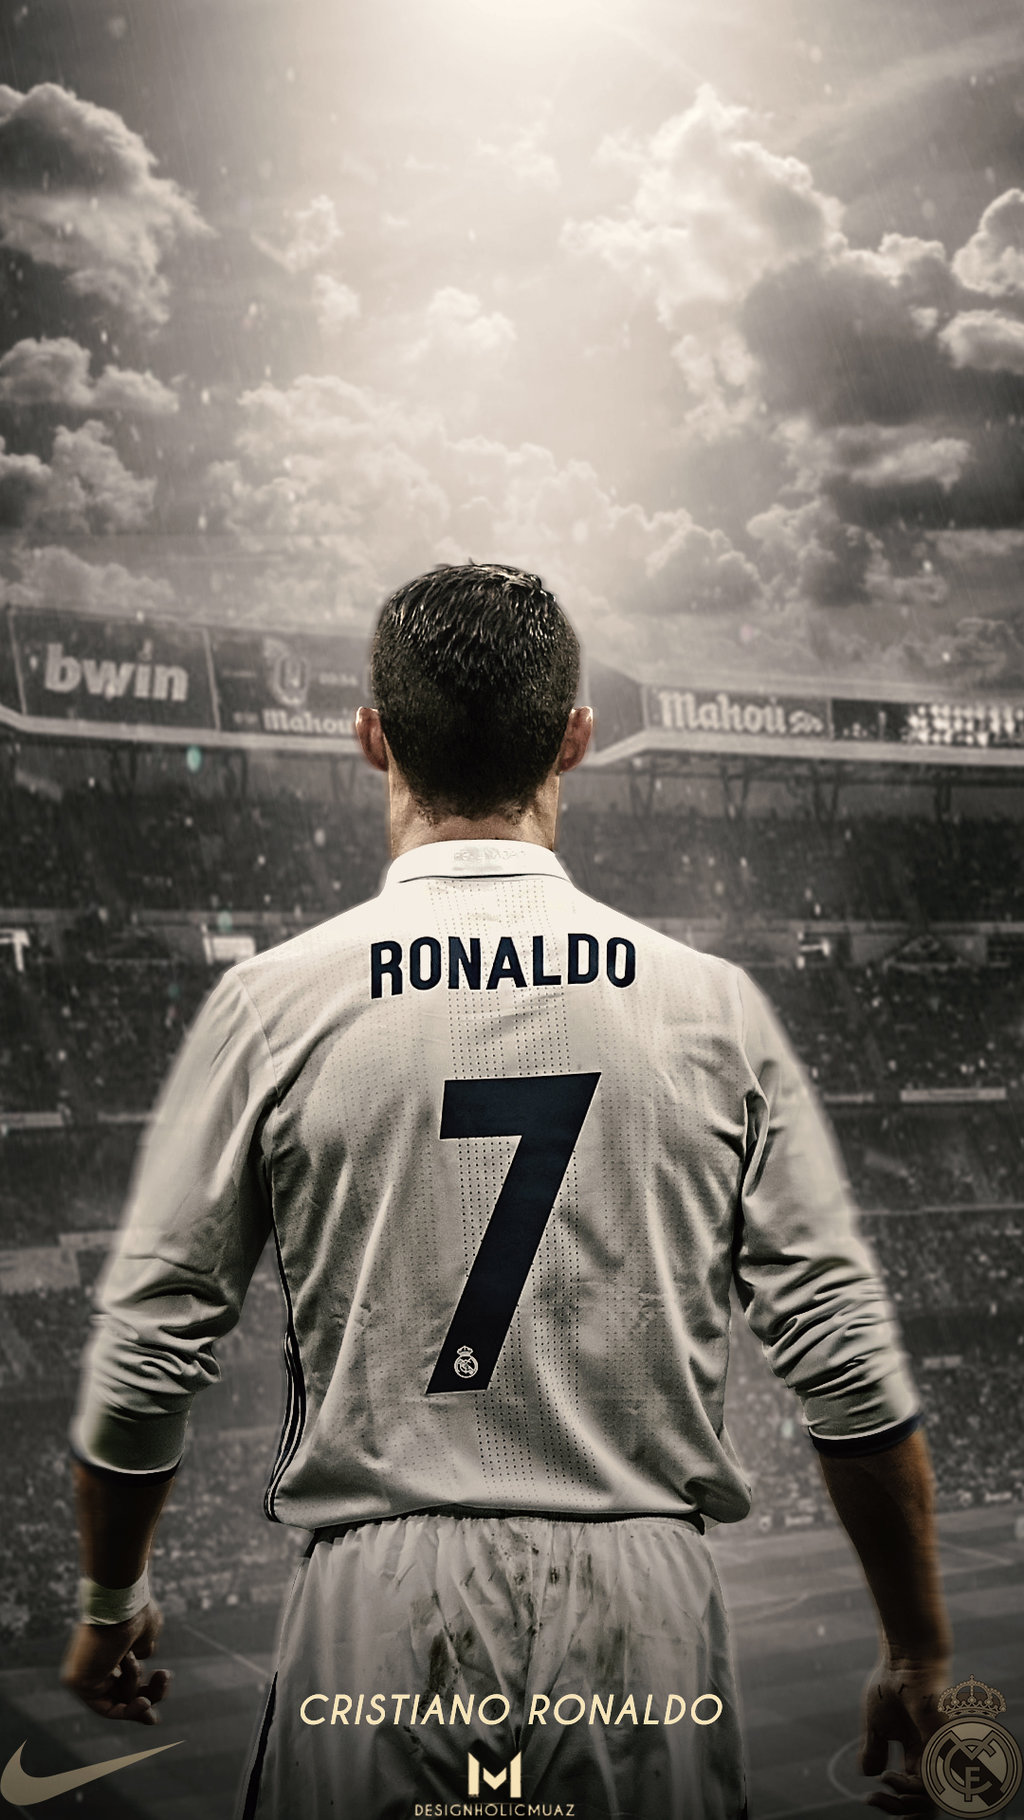 Free Download Wallpaper Cristiano Ronaldo Cristiano Ronaldo Real Madrid Cr9 1024x1820 For Your Desktop Mobile Tablet Explore 29 Wallpaper Real Madrid 2017 Deviantart Wallpaper Real Madrid 2017 Deviantart Wallpaper